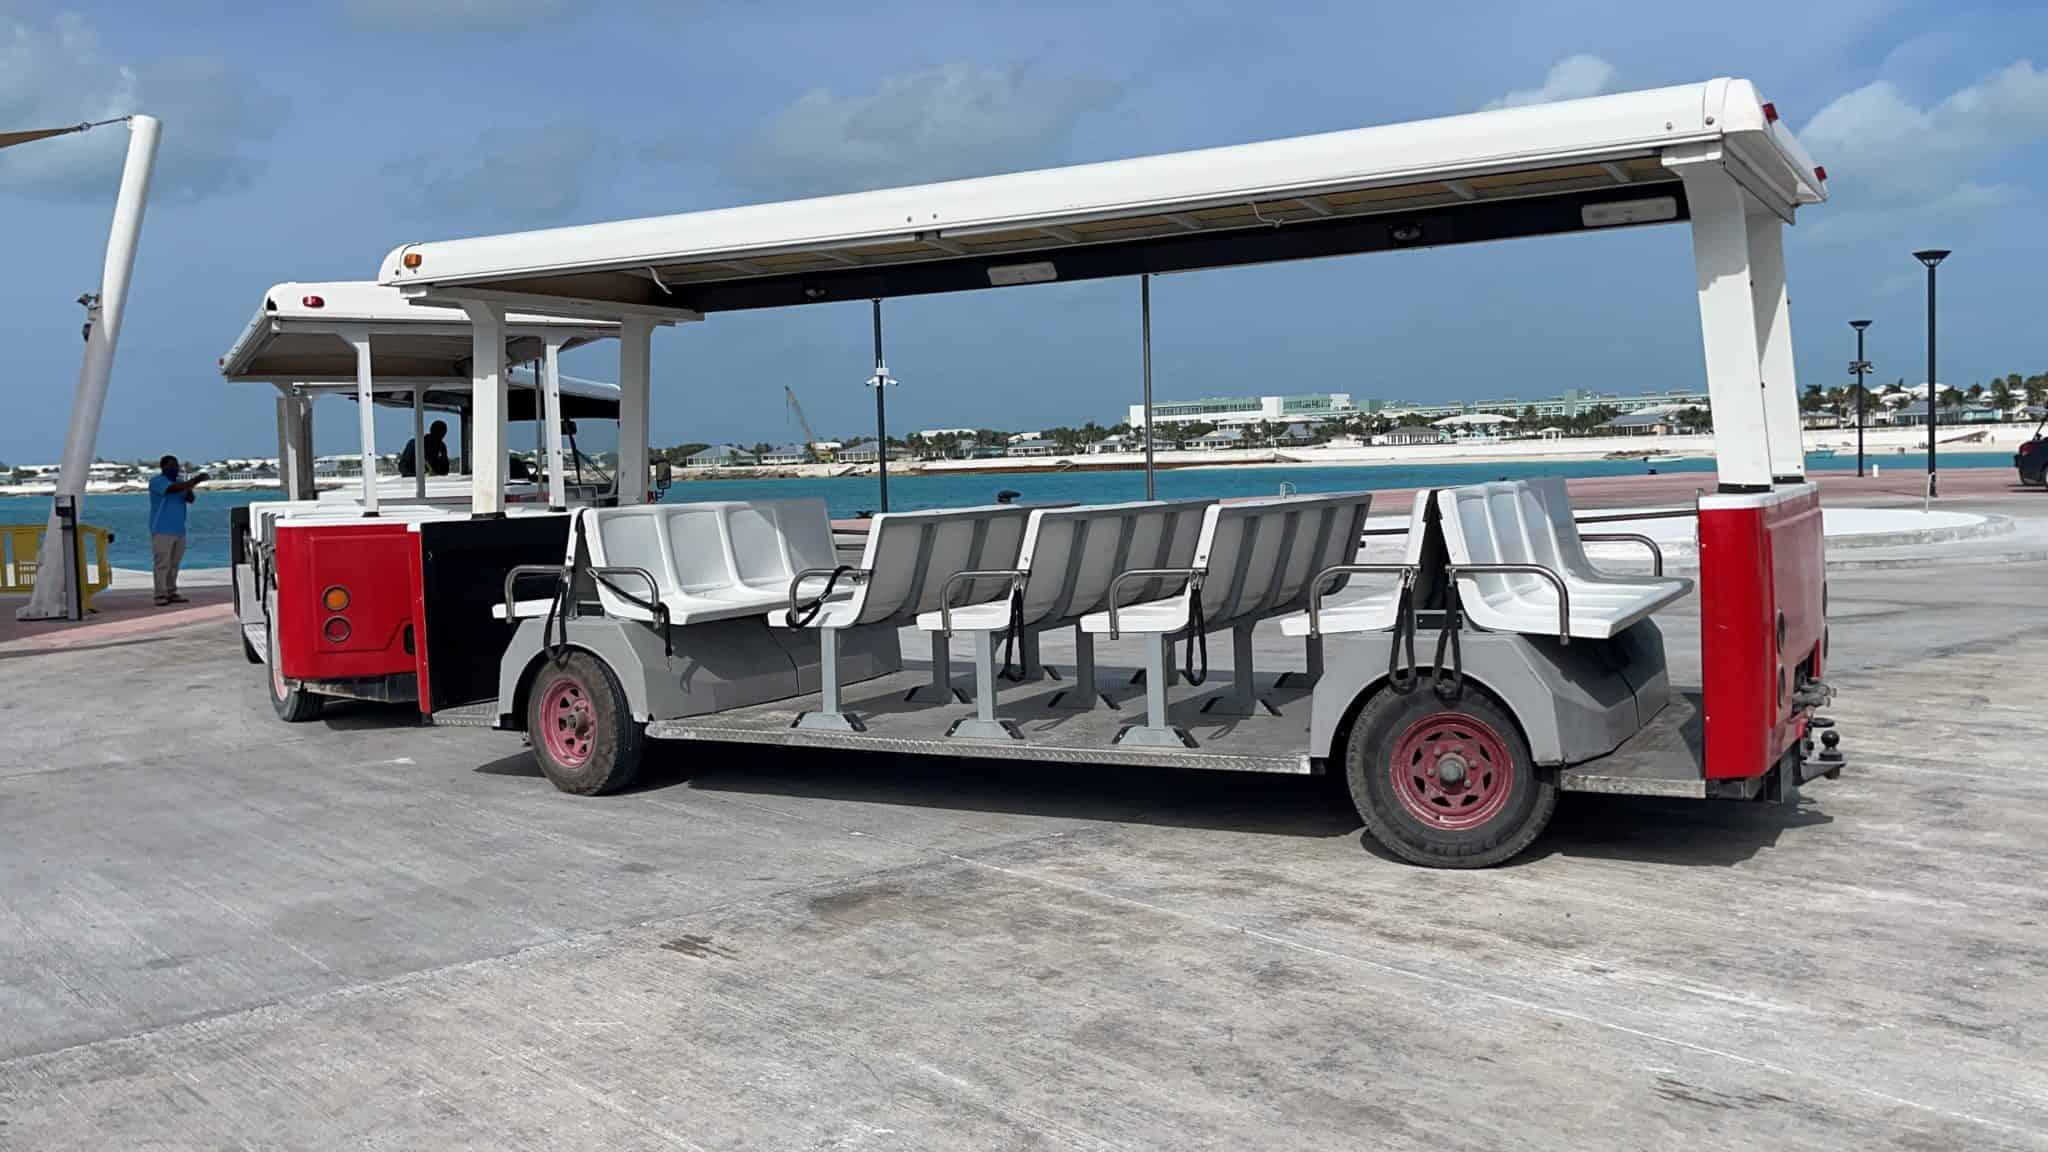 bimini bahamas resorts world tram